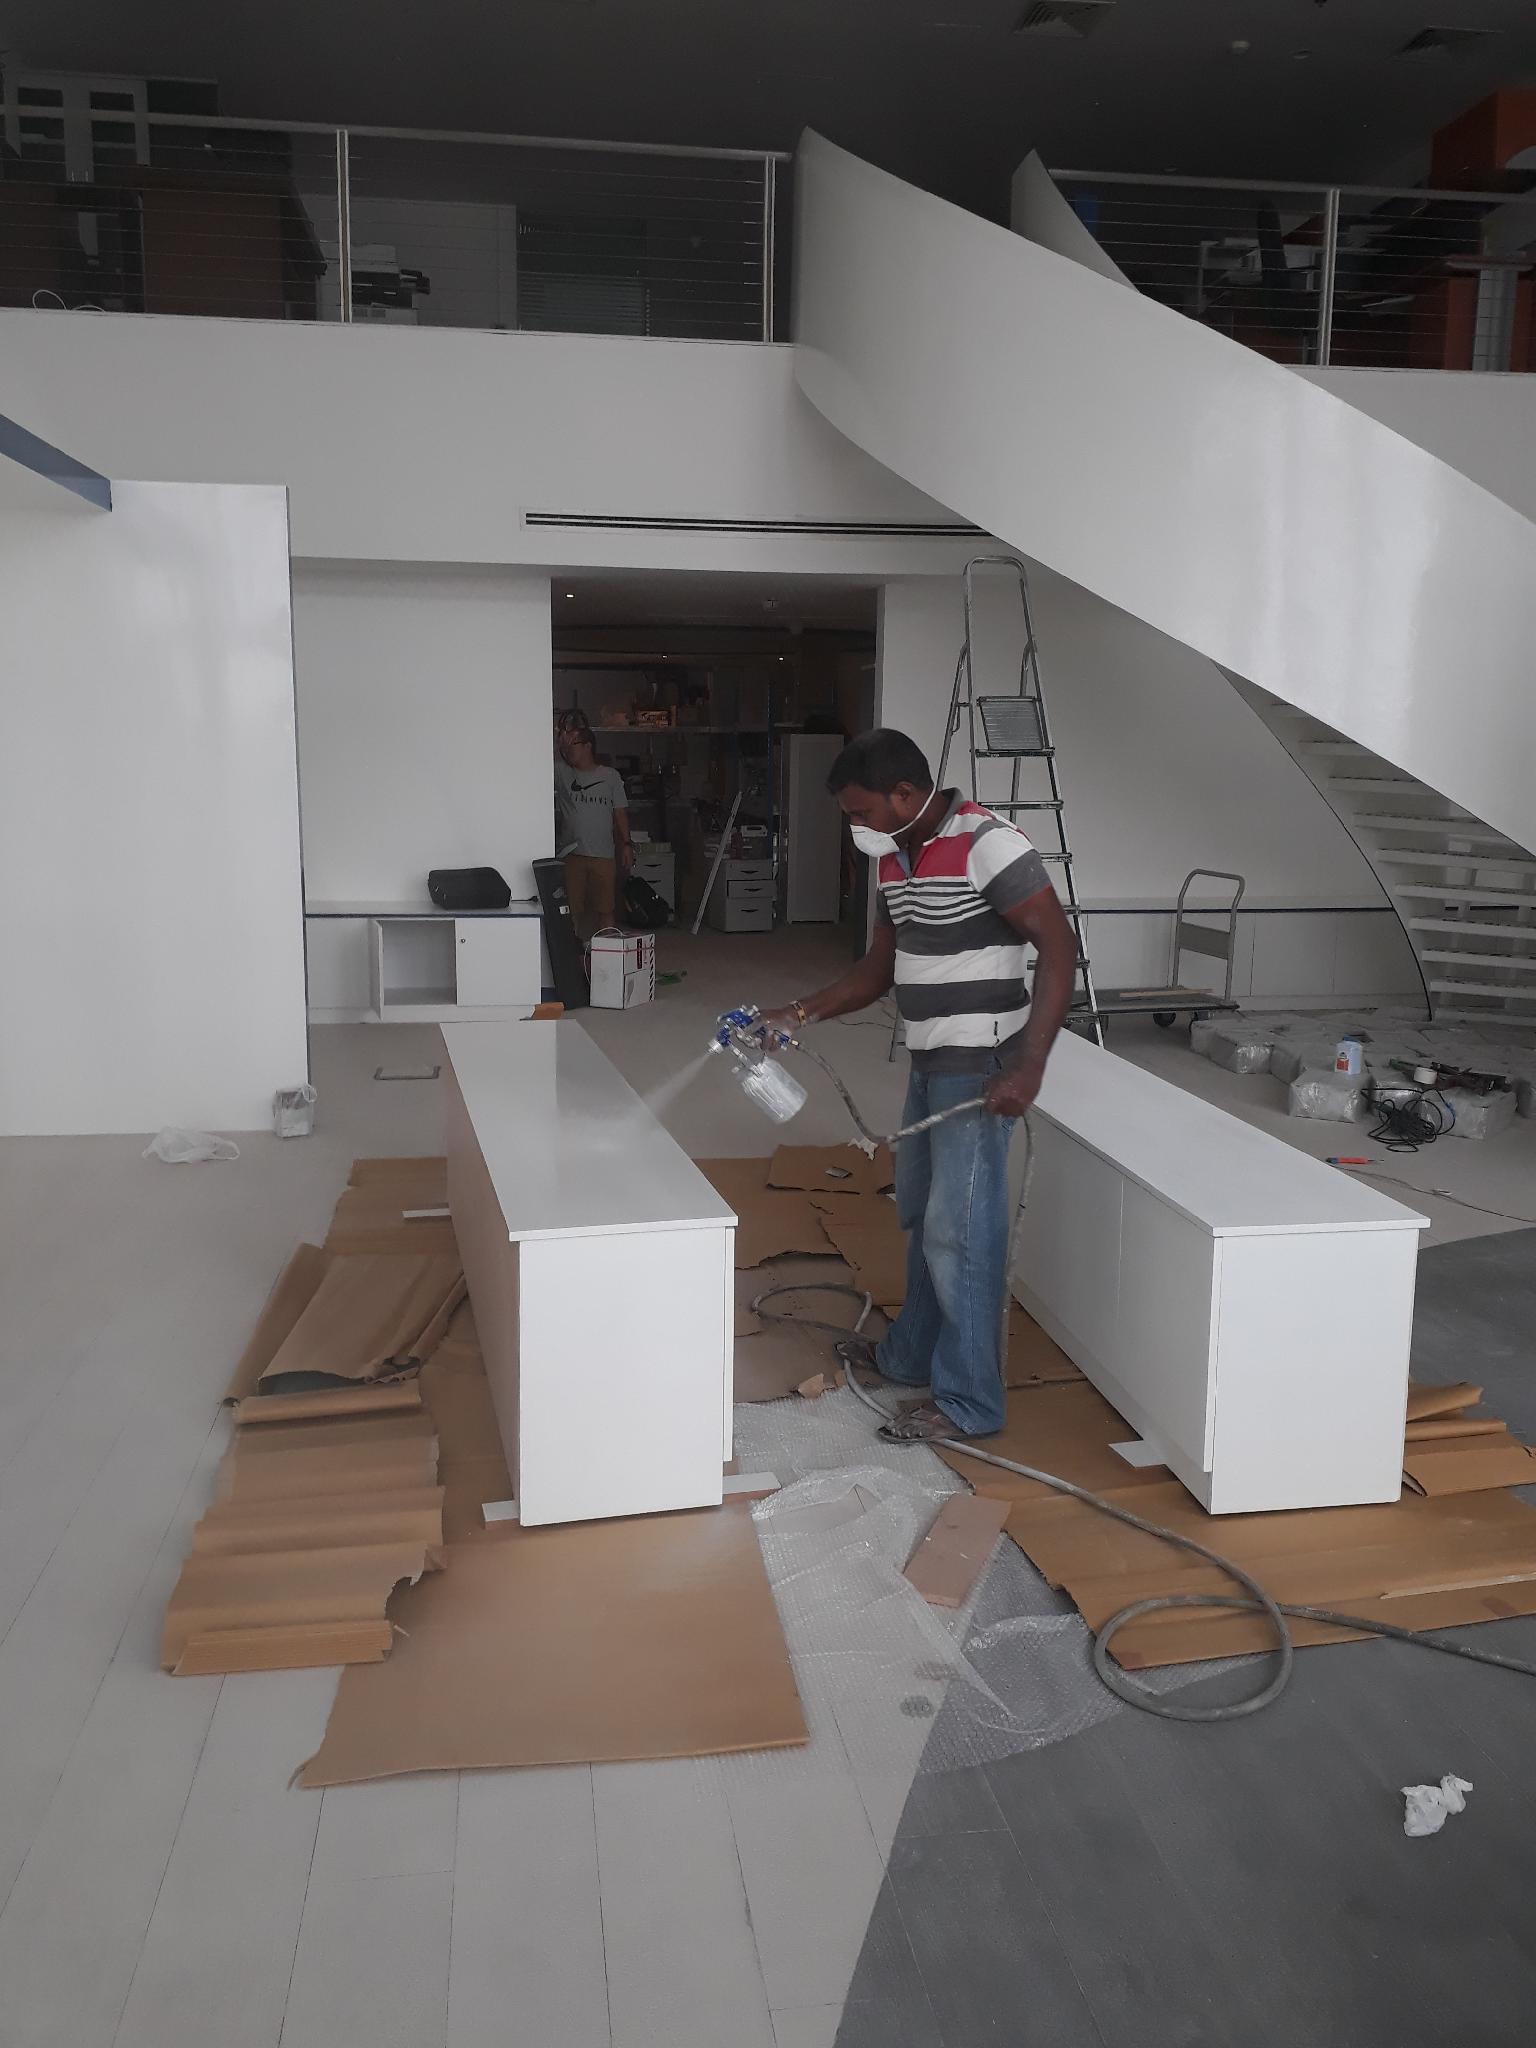 Carpentar, paintng, spray paint professional, main